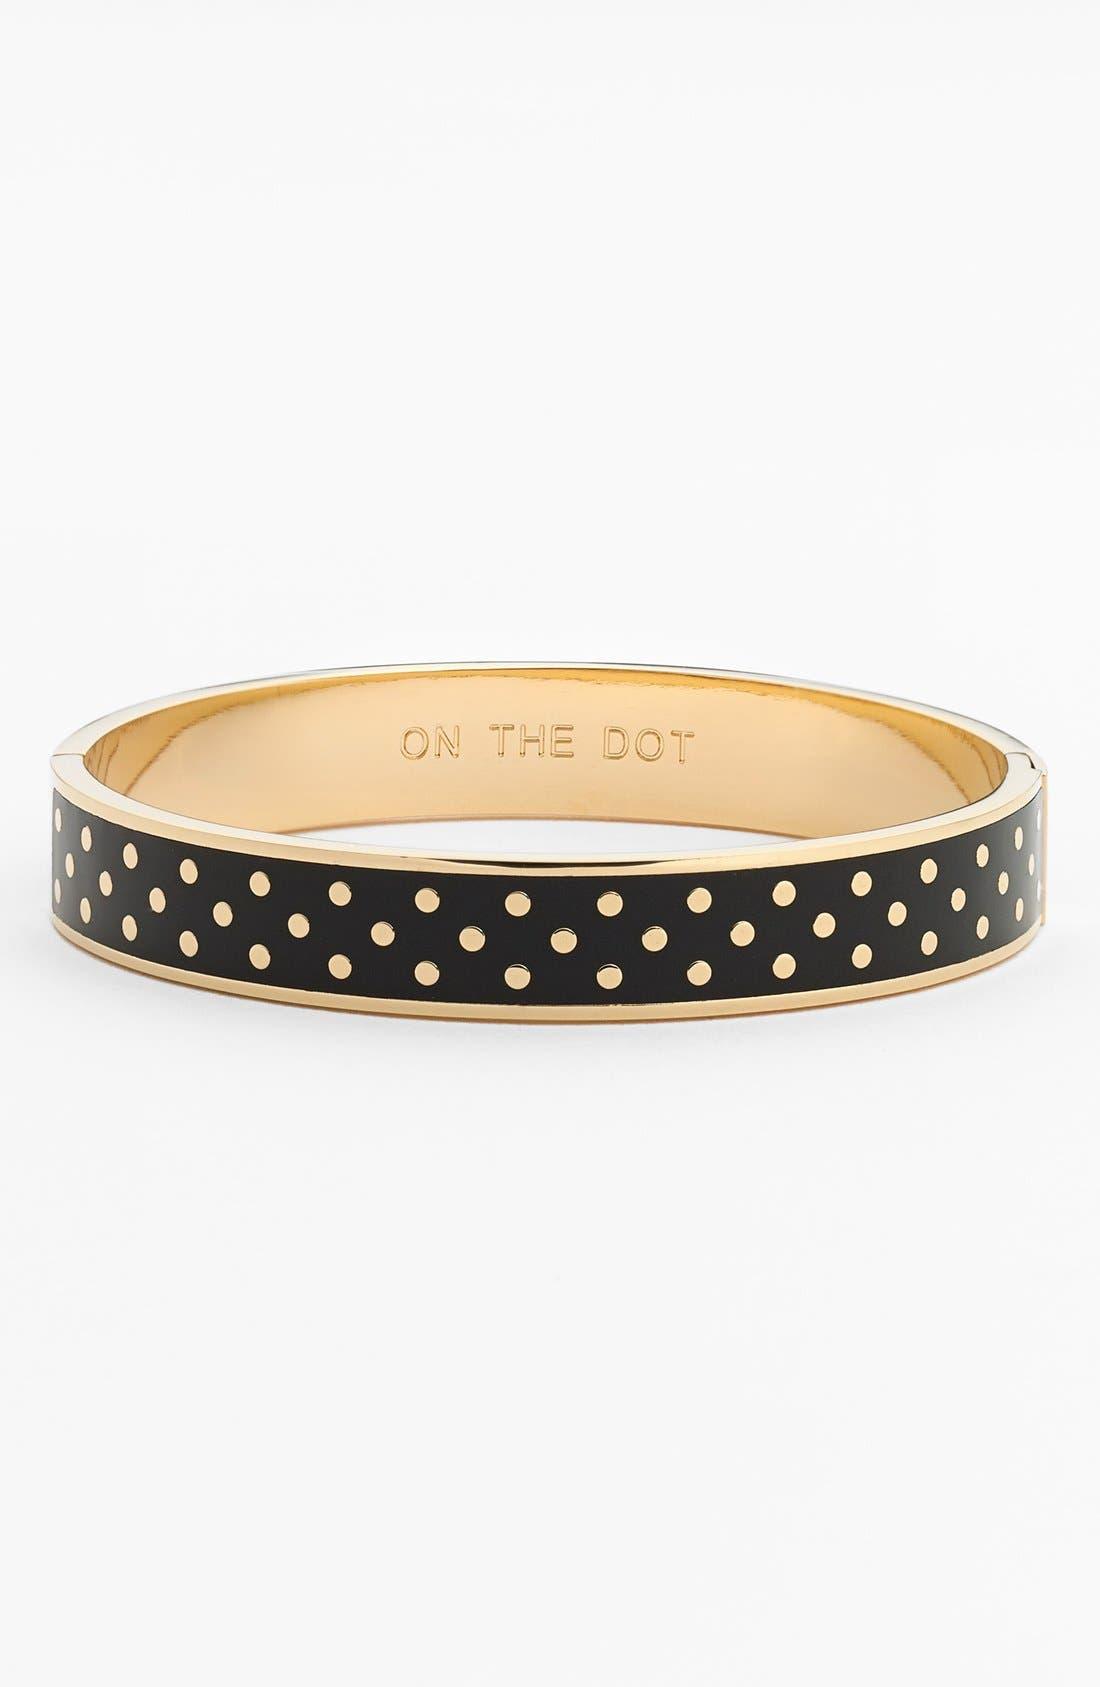 Main Image - kate spade new york 'on the dot' hinge idiom bracelet